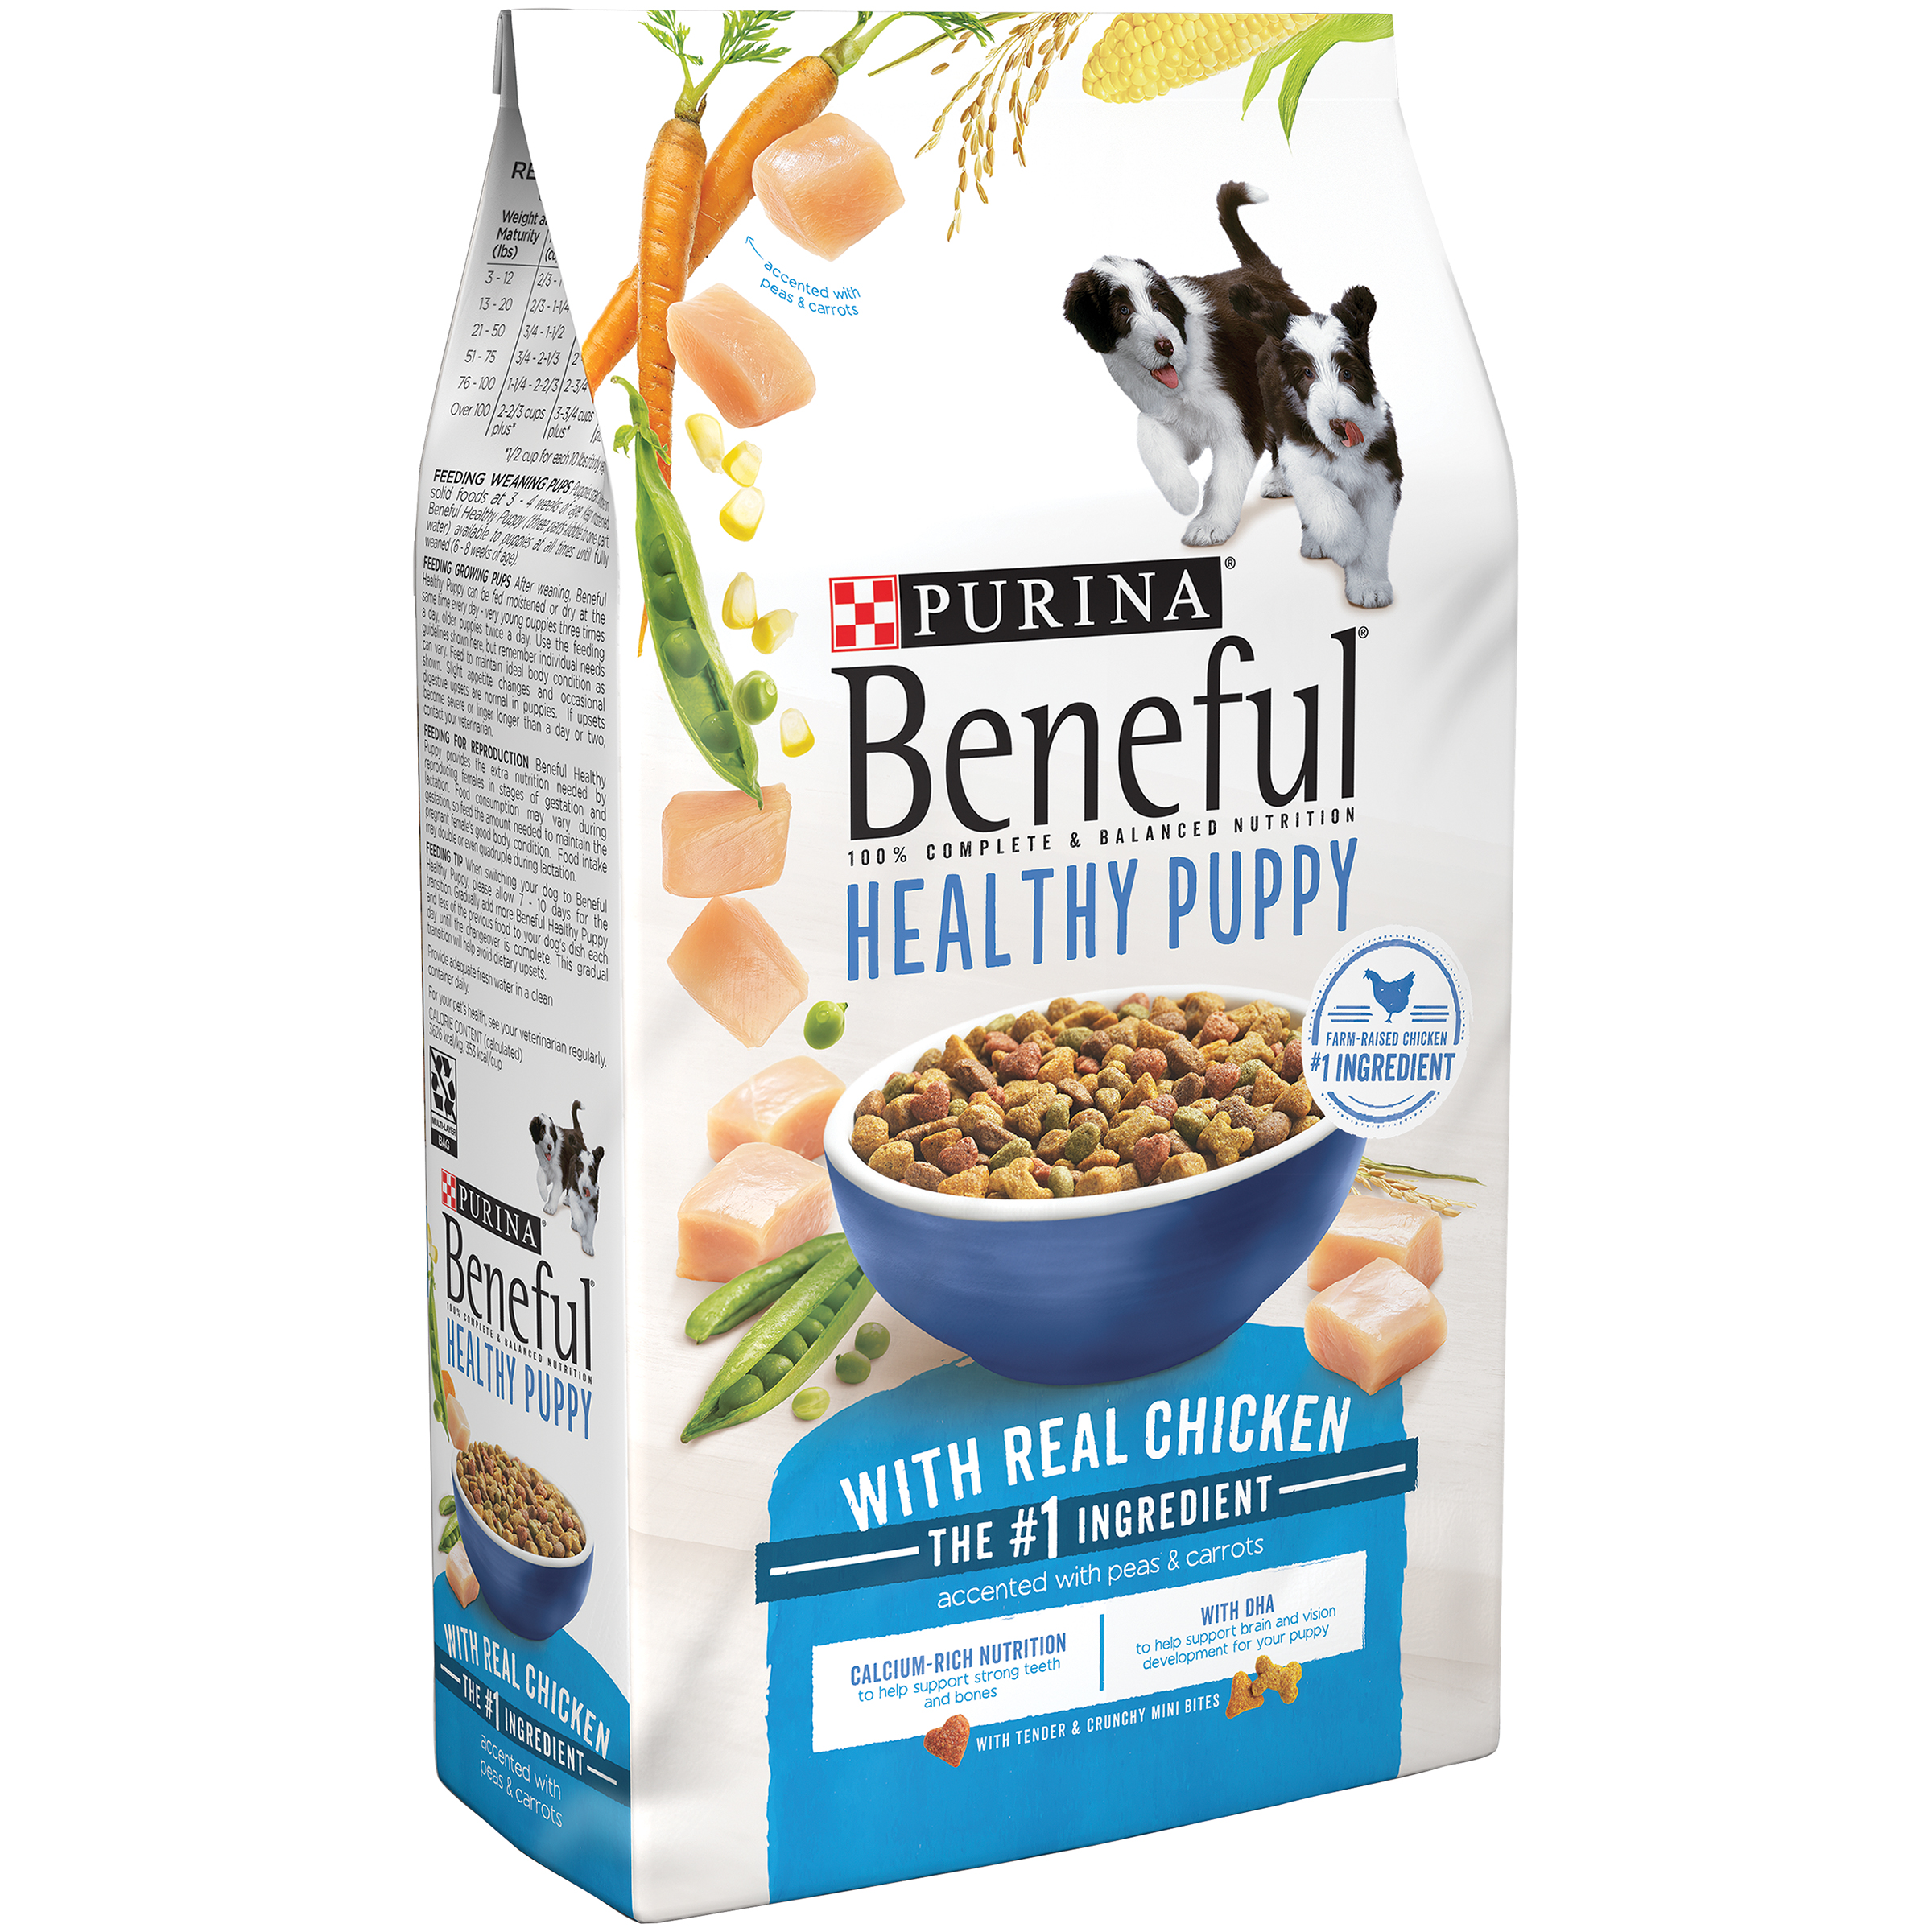 Purina Beneful Healthy Puppy Dry Dog Food 6.3 lb. Bag